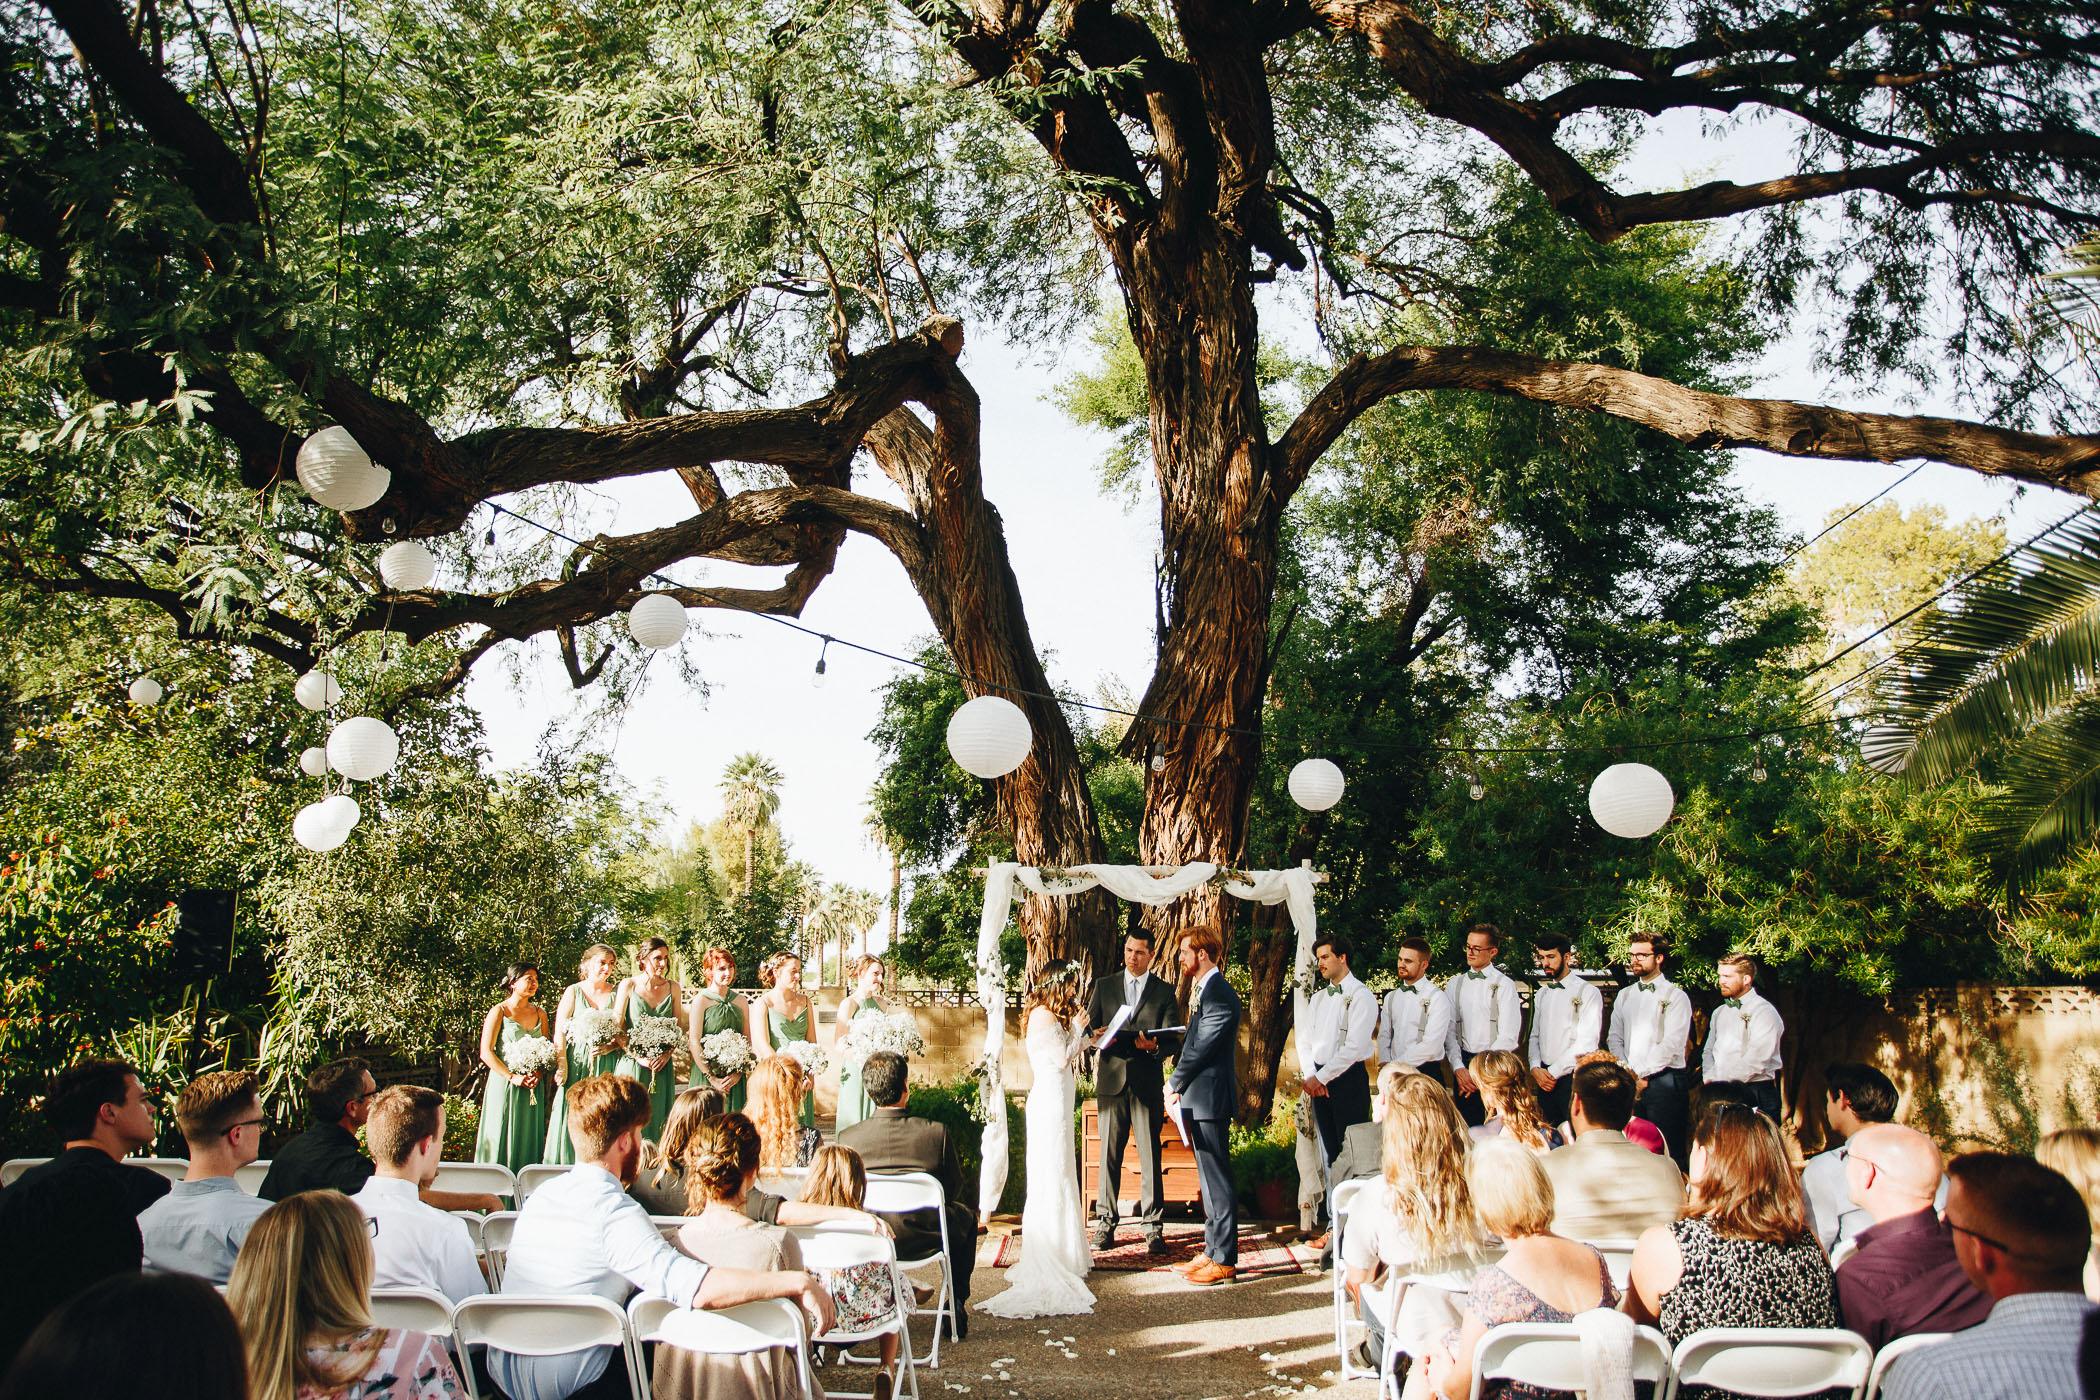 181104-Luxium-Weddings-Arizona-@matt__Le-Brandon-Kariana-Phoenix-Valley-Garden-Center-1064.jpg